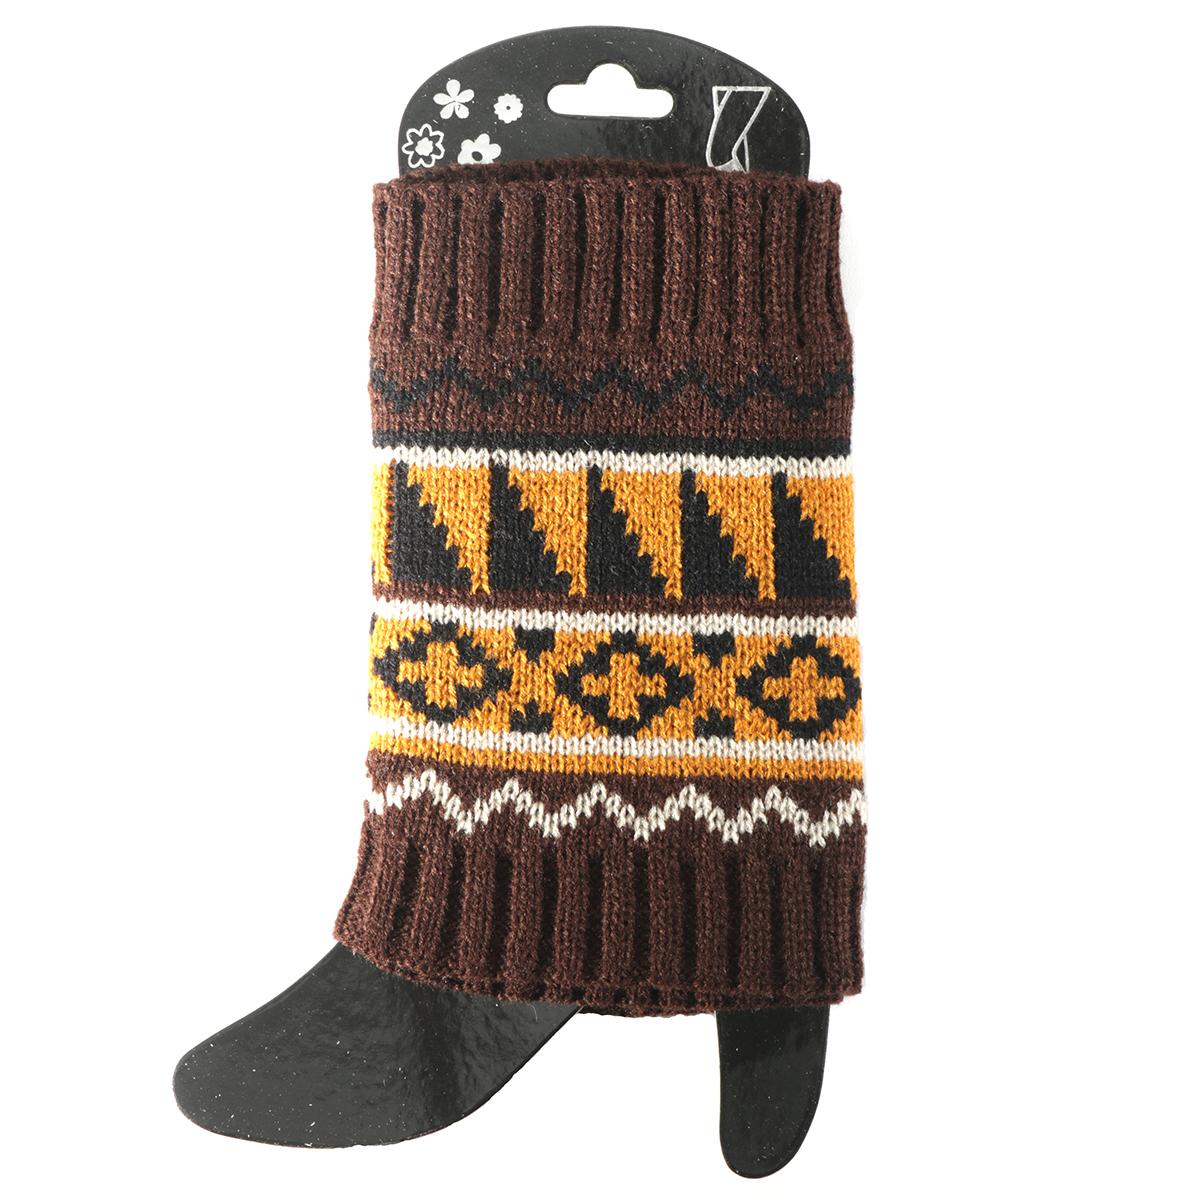 Brown/Orange Sweater Boot Cuff Short